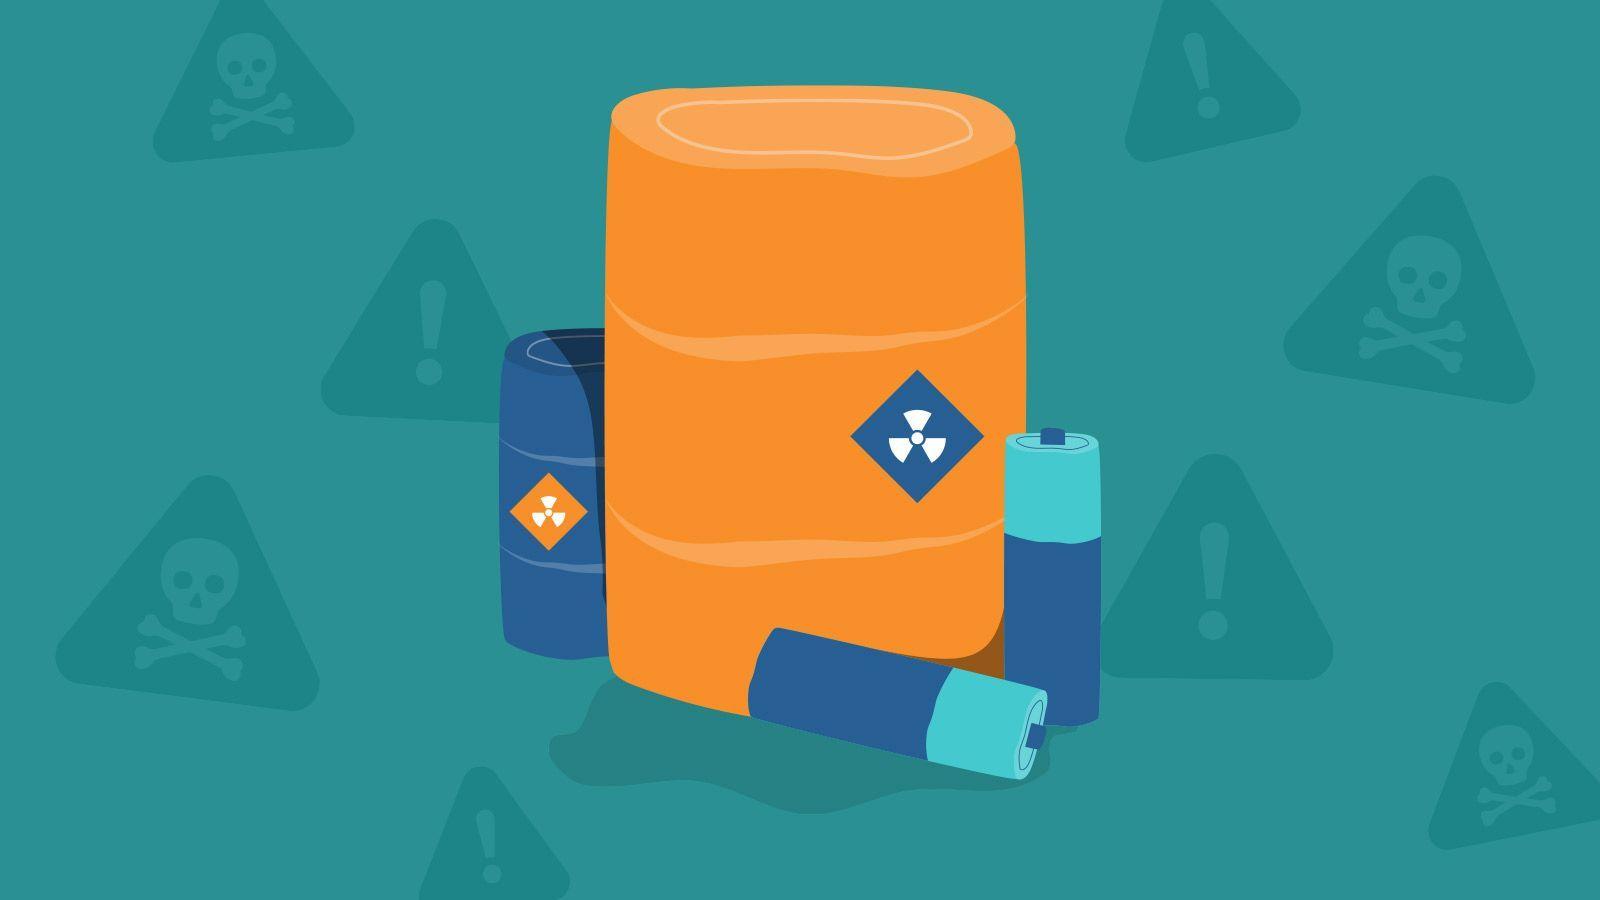 How to Ship Hazardous Materials